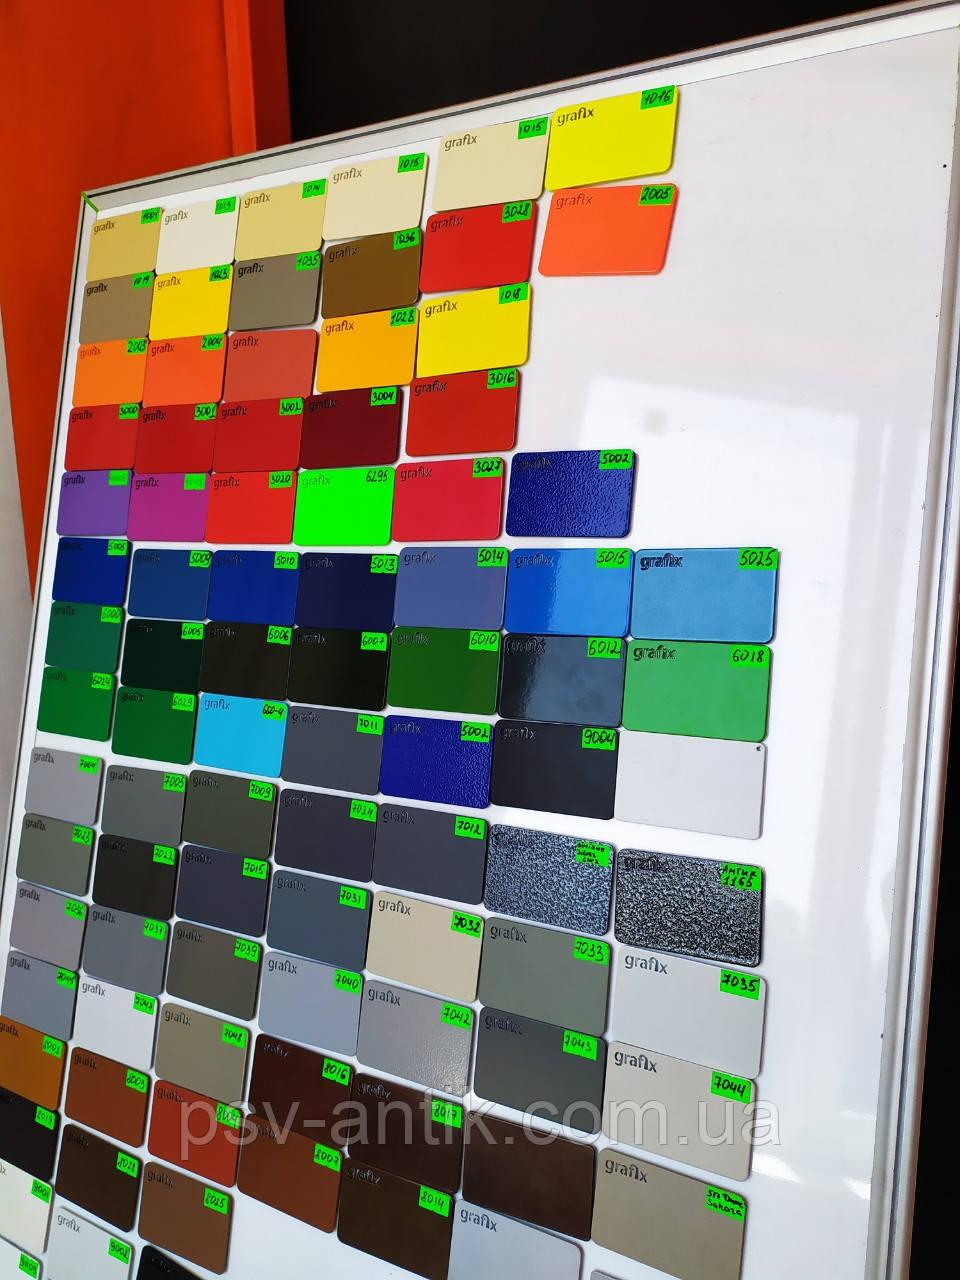 Порошковая краска глянцевая, полиэфирная, архитектурная, 8017